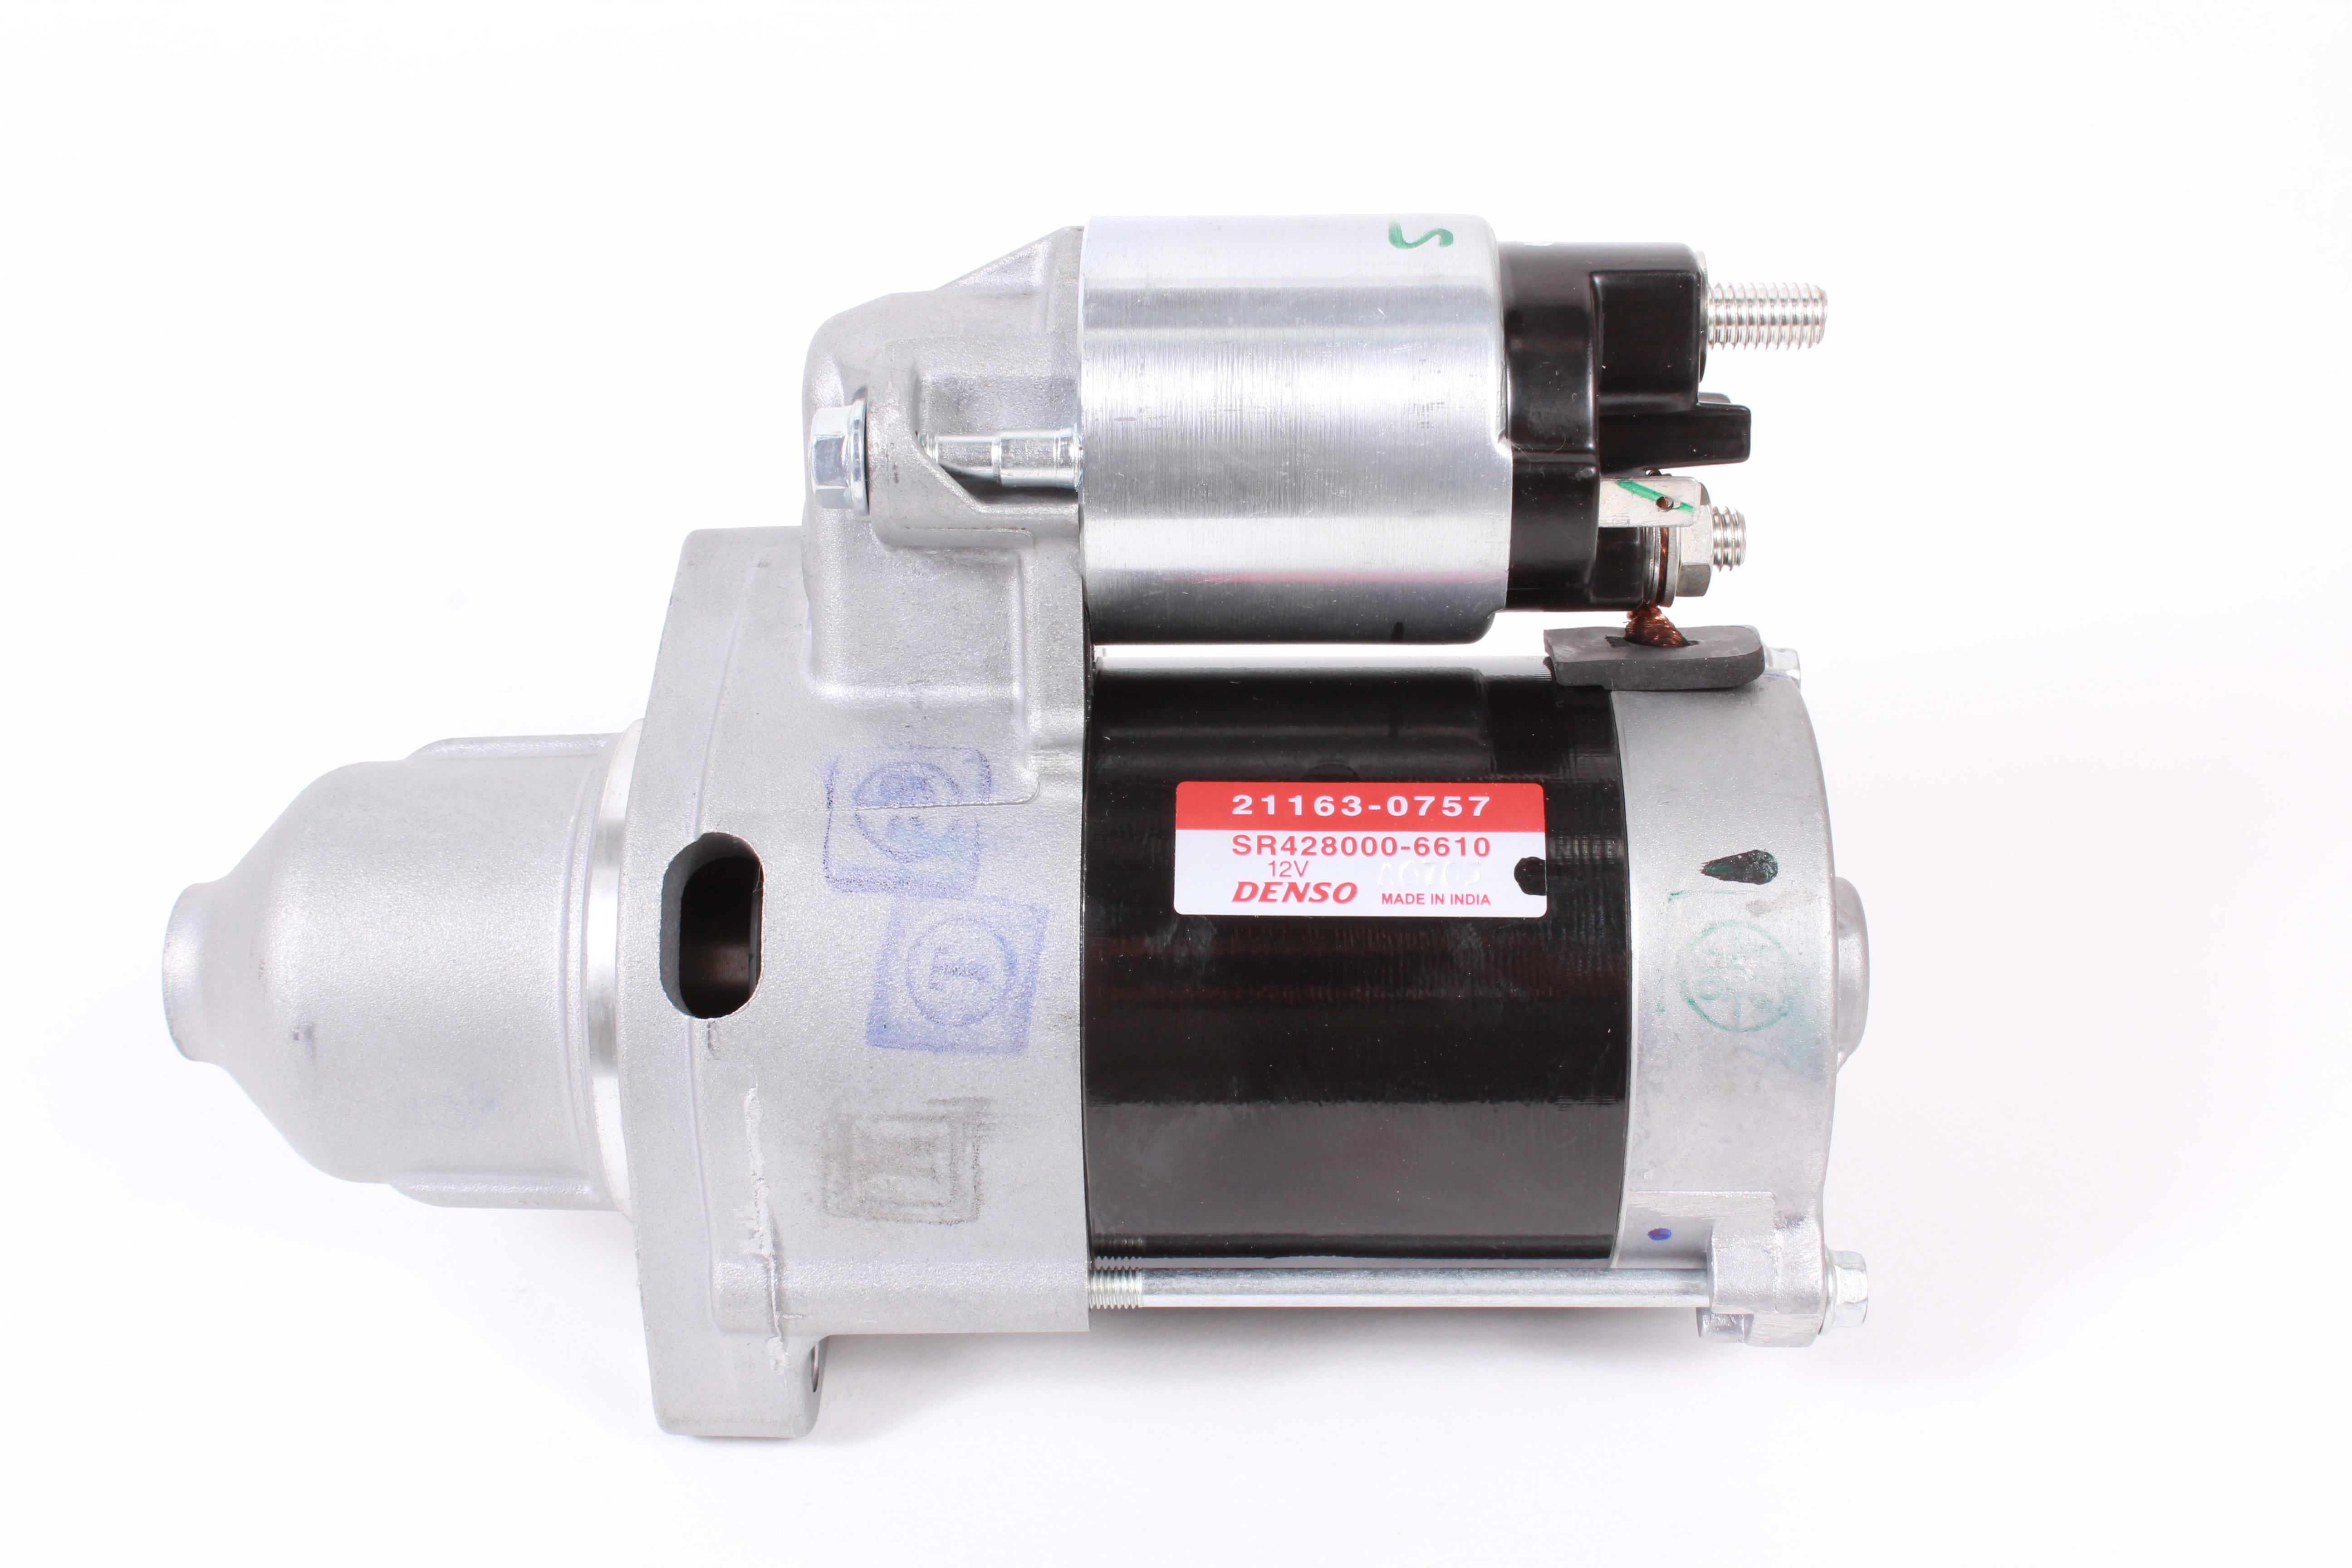 Electric Starter For Kawasaki 99996-6121 FX751V FX801V FX850V FX921V FXT00V Z830